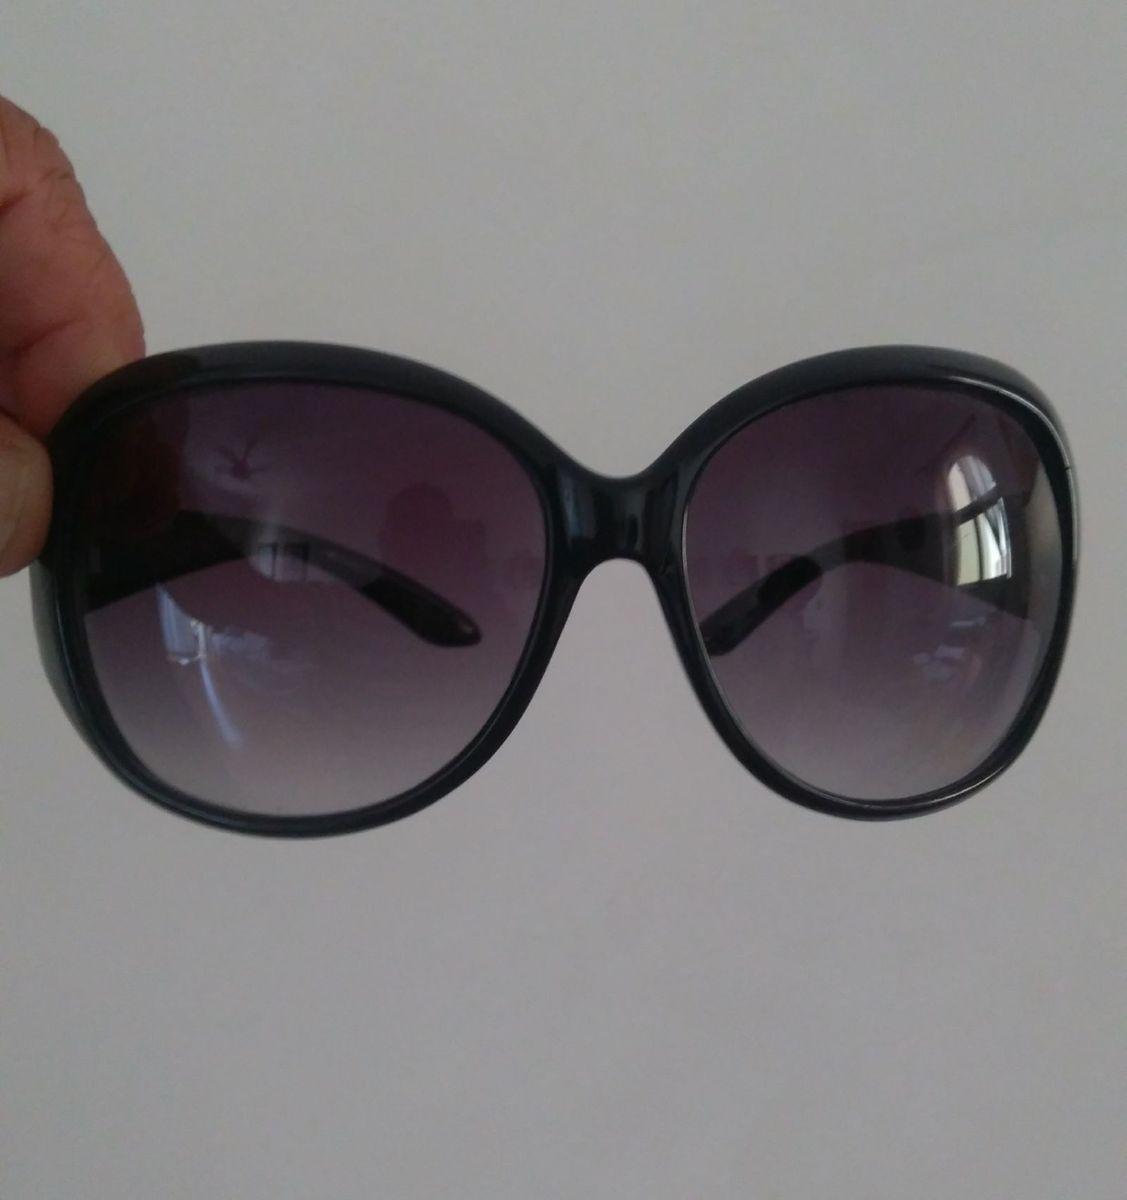 a9e59bee9 oculos armani feminino - óculos armani.  Czm6ly9wag90b3muzw5qb2vplmnvbs5ici9wcm9kdwn0cy82odg4ndywl2m1ndlmmdhhymqwotjlntvmmzjlytywy2e2zdq4oda3lmpwzw